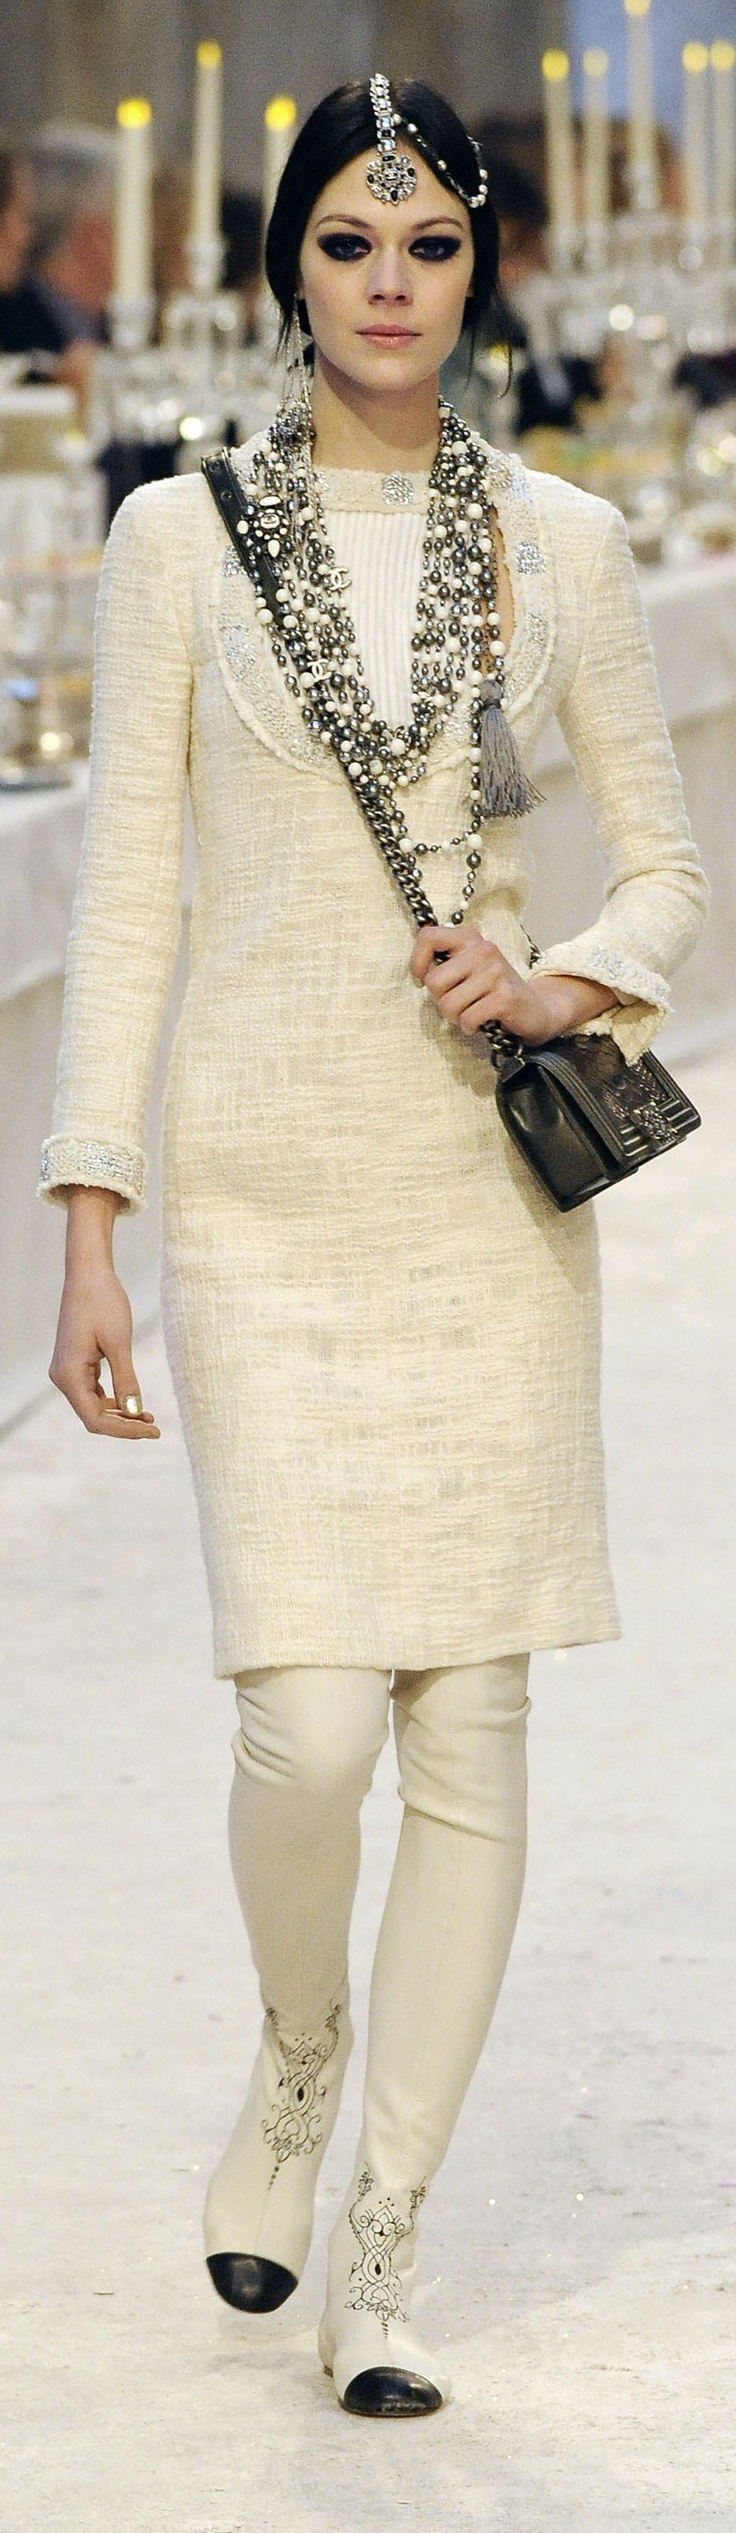 Chanels influence on fashion essay